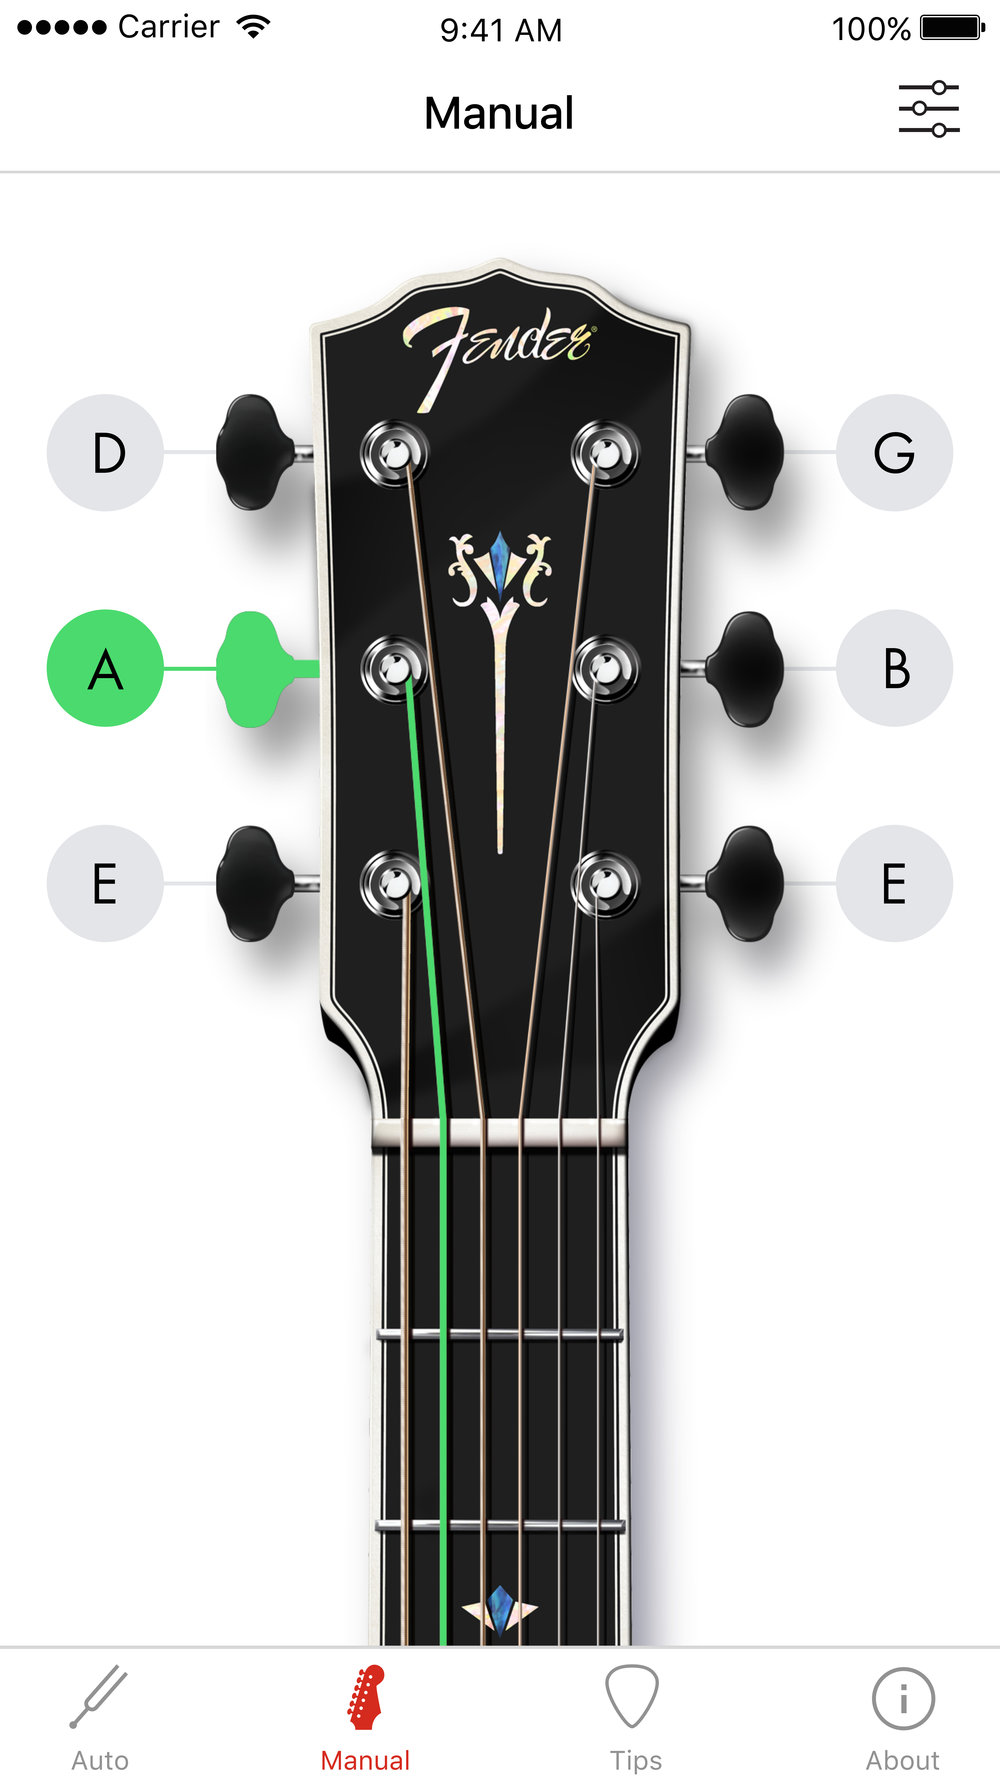 tuner-manual-acoustic.jpg